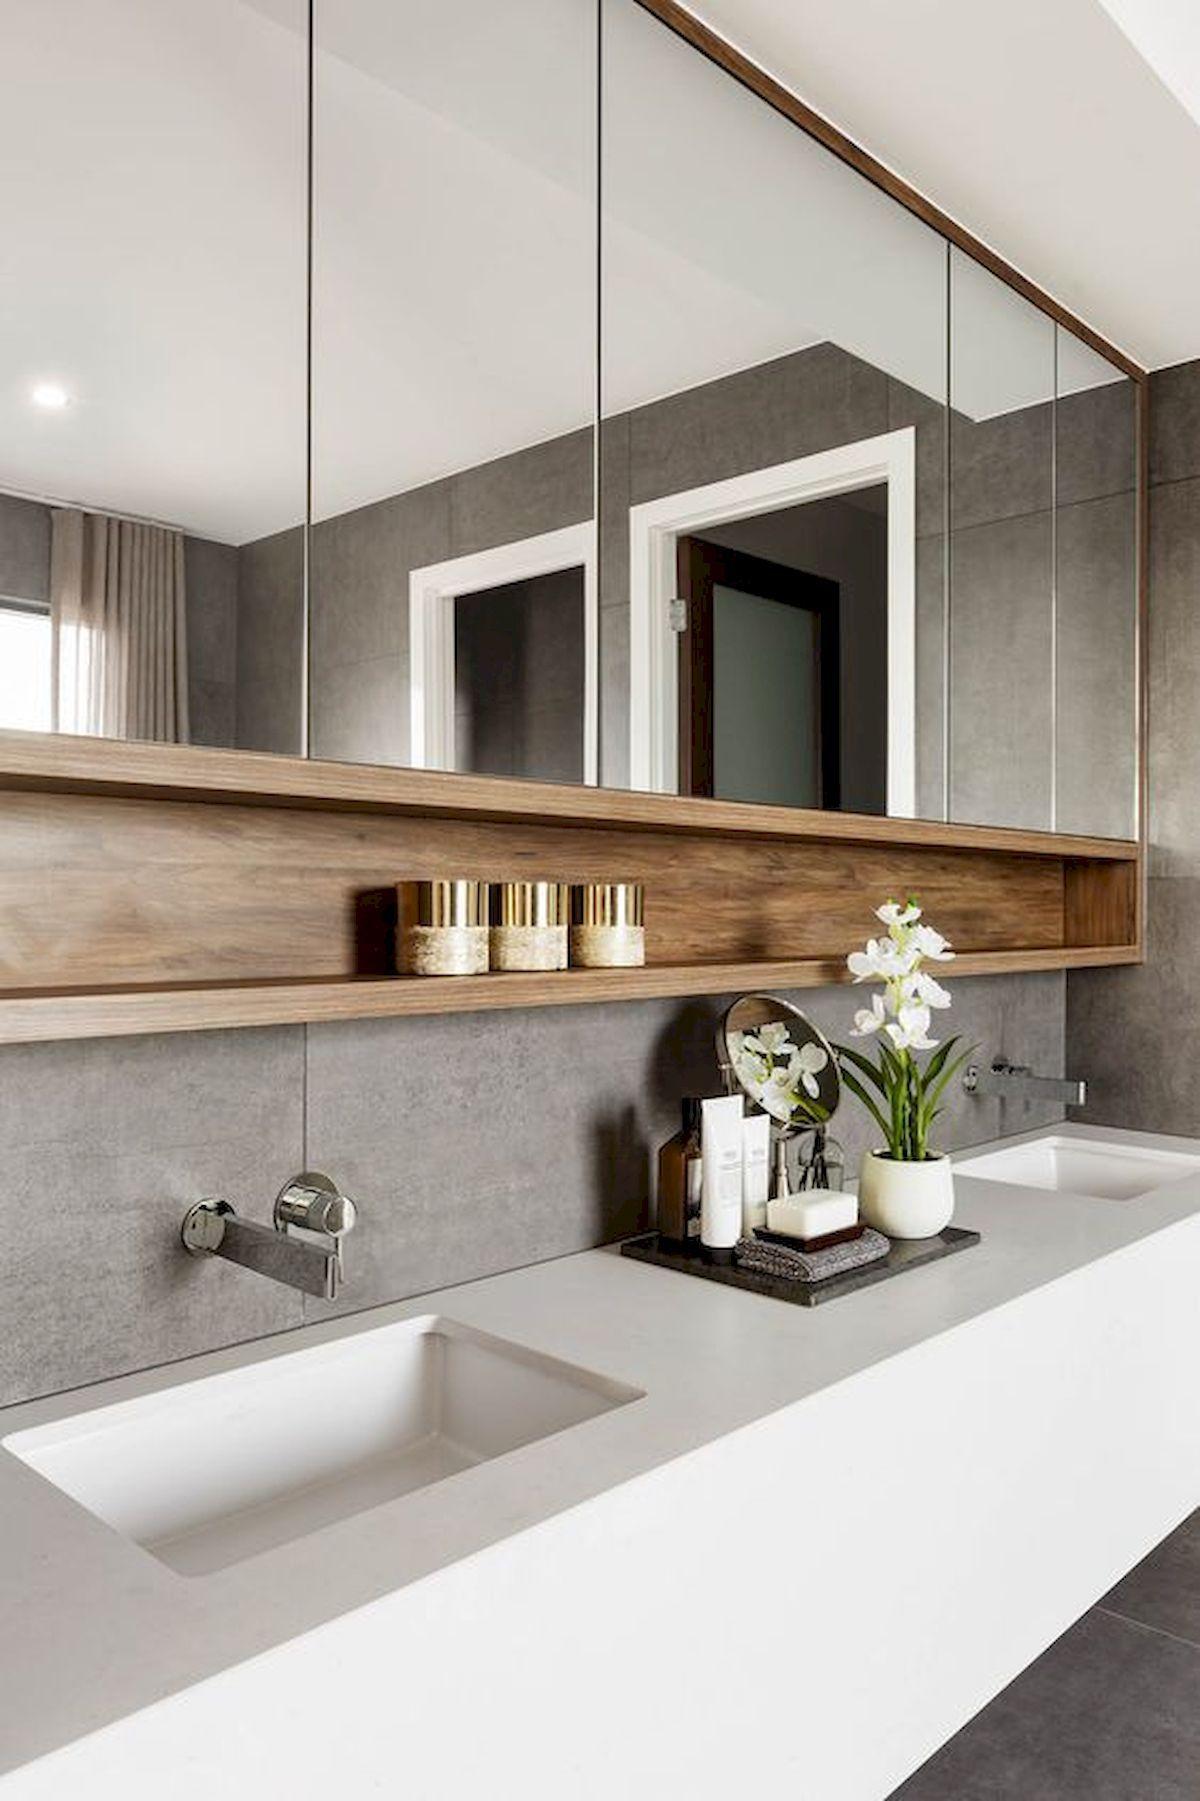 2019 Best Farmhouse Bathroom Mirror Design Ideas And Decor Worldecor Co Farmhouse Bathroom Mirrors Bathroom Interior Design Modern Bathroom Design